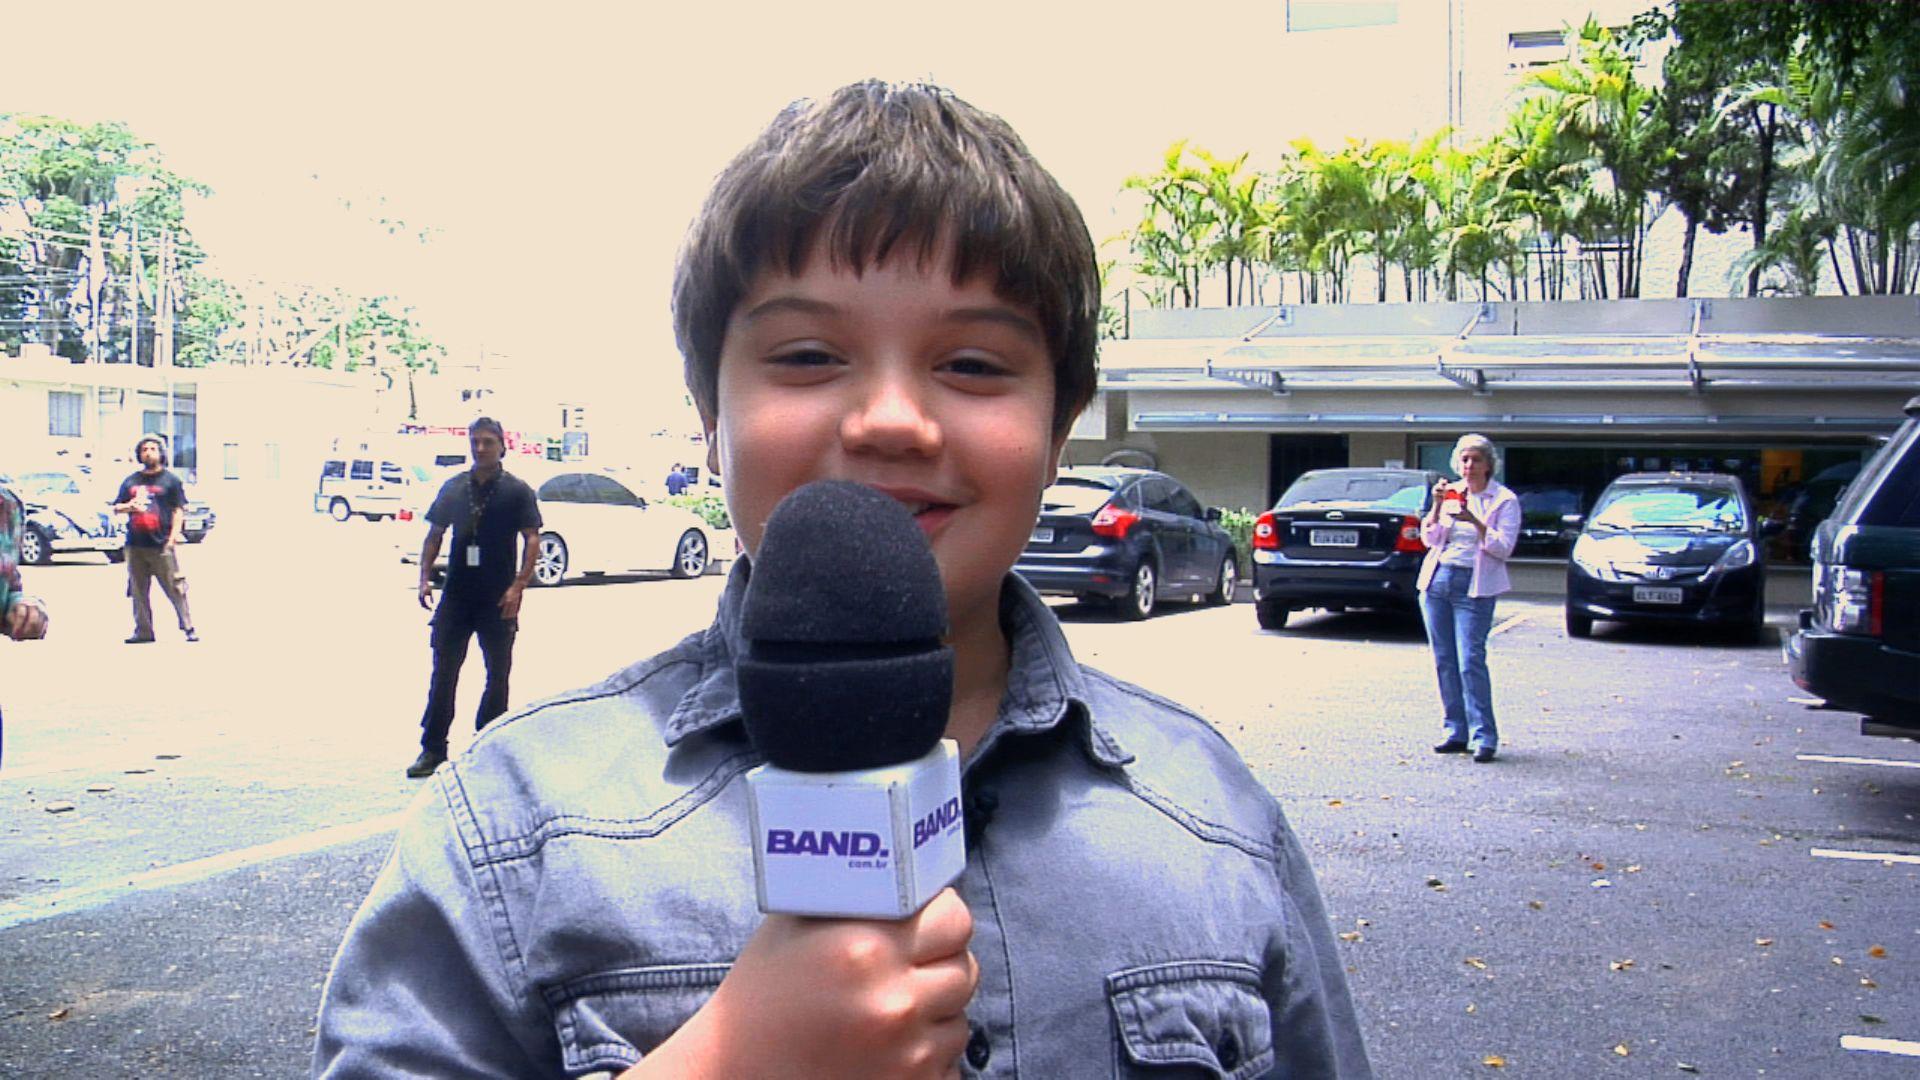 Matheus segurando o microfone